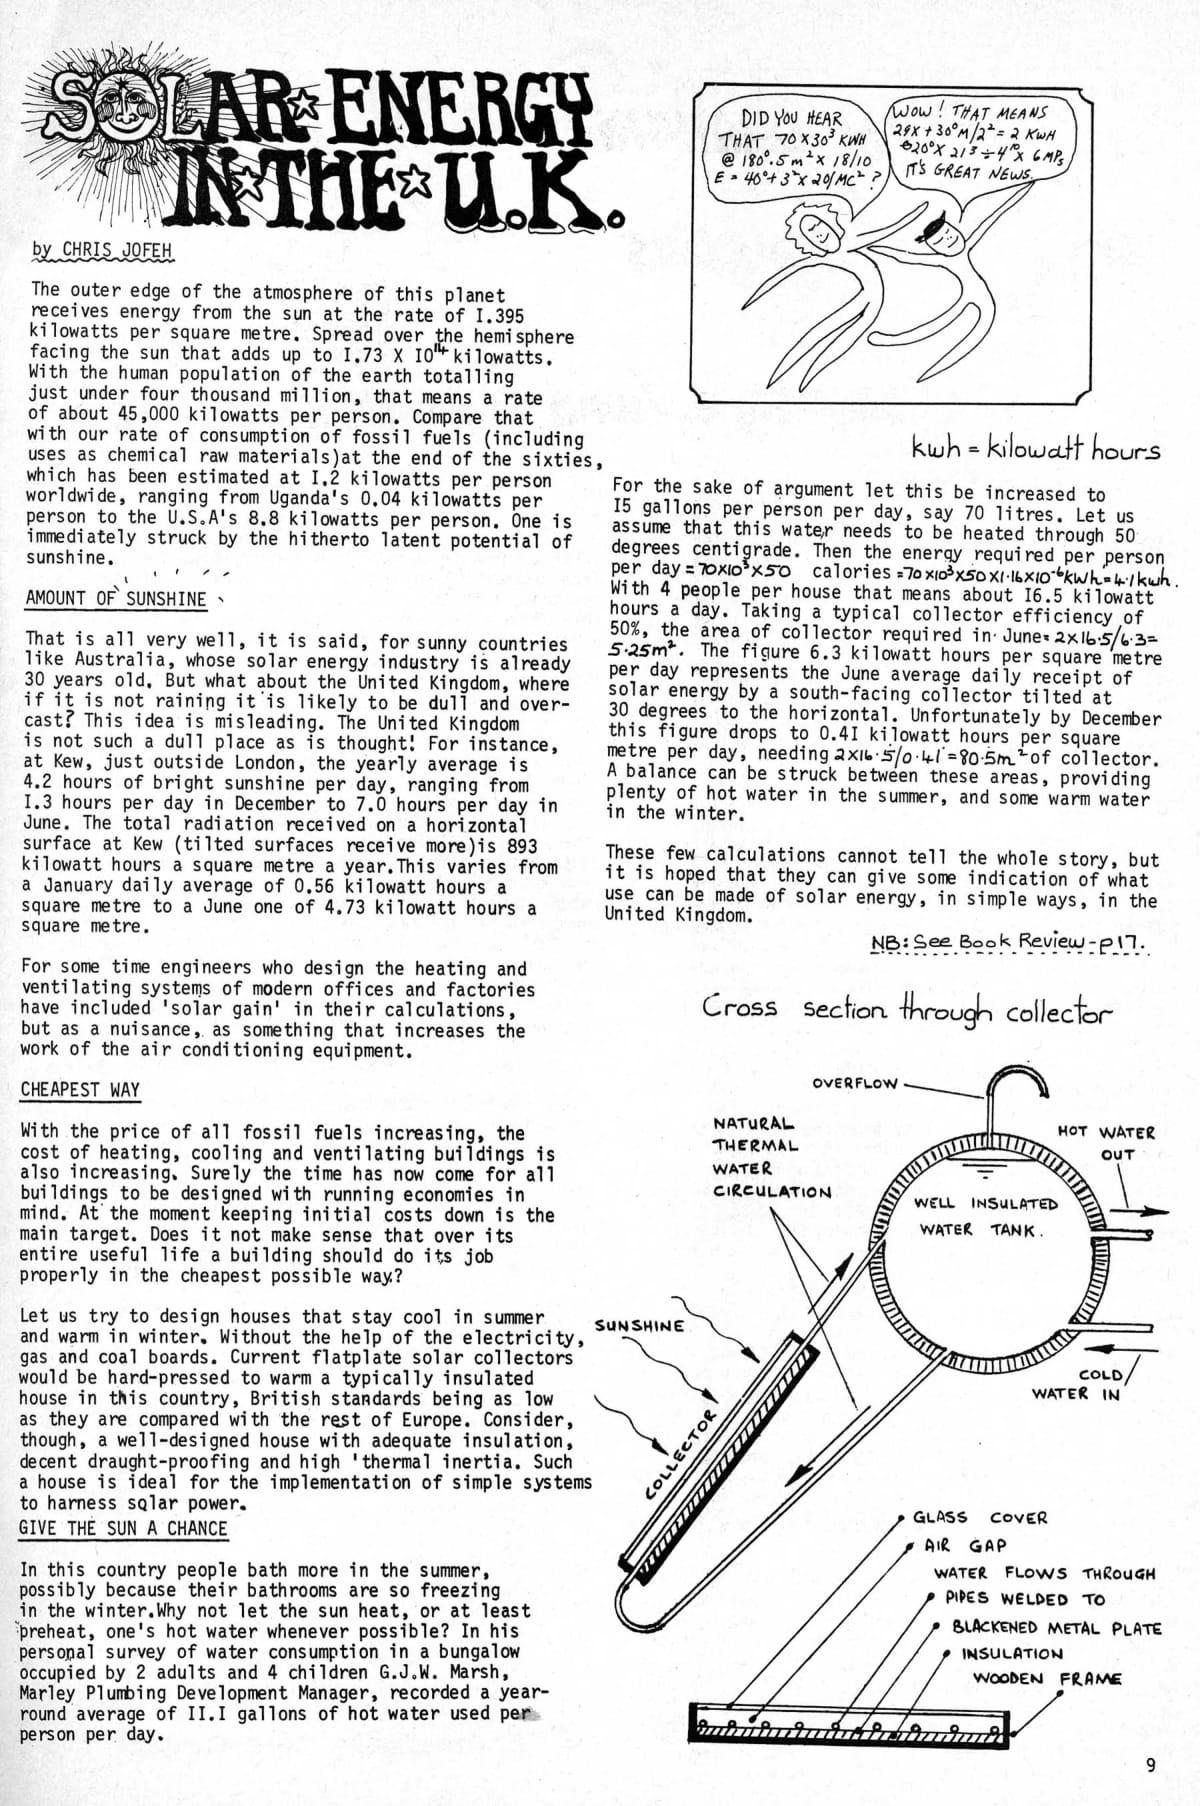 seed-v3-n10-oct1974-09.jpg